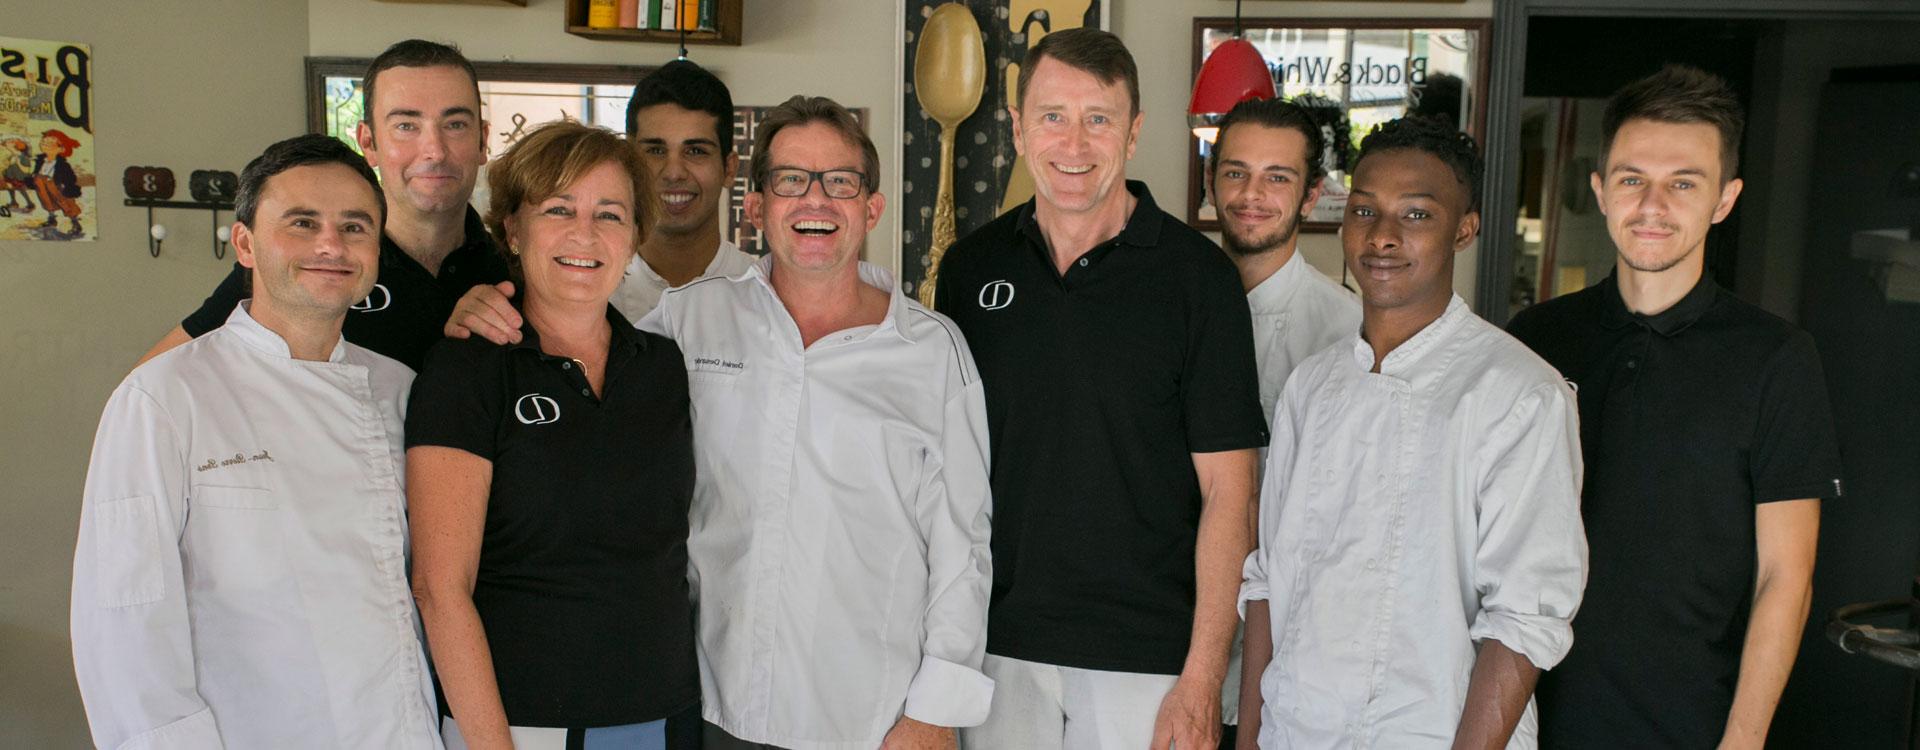 equipe restaurant gastronomique et bistrot daniel desavie à valbonne sophia antipolis